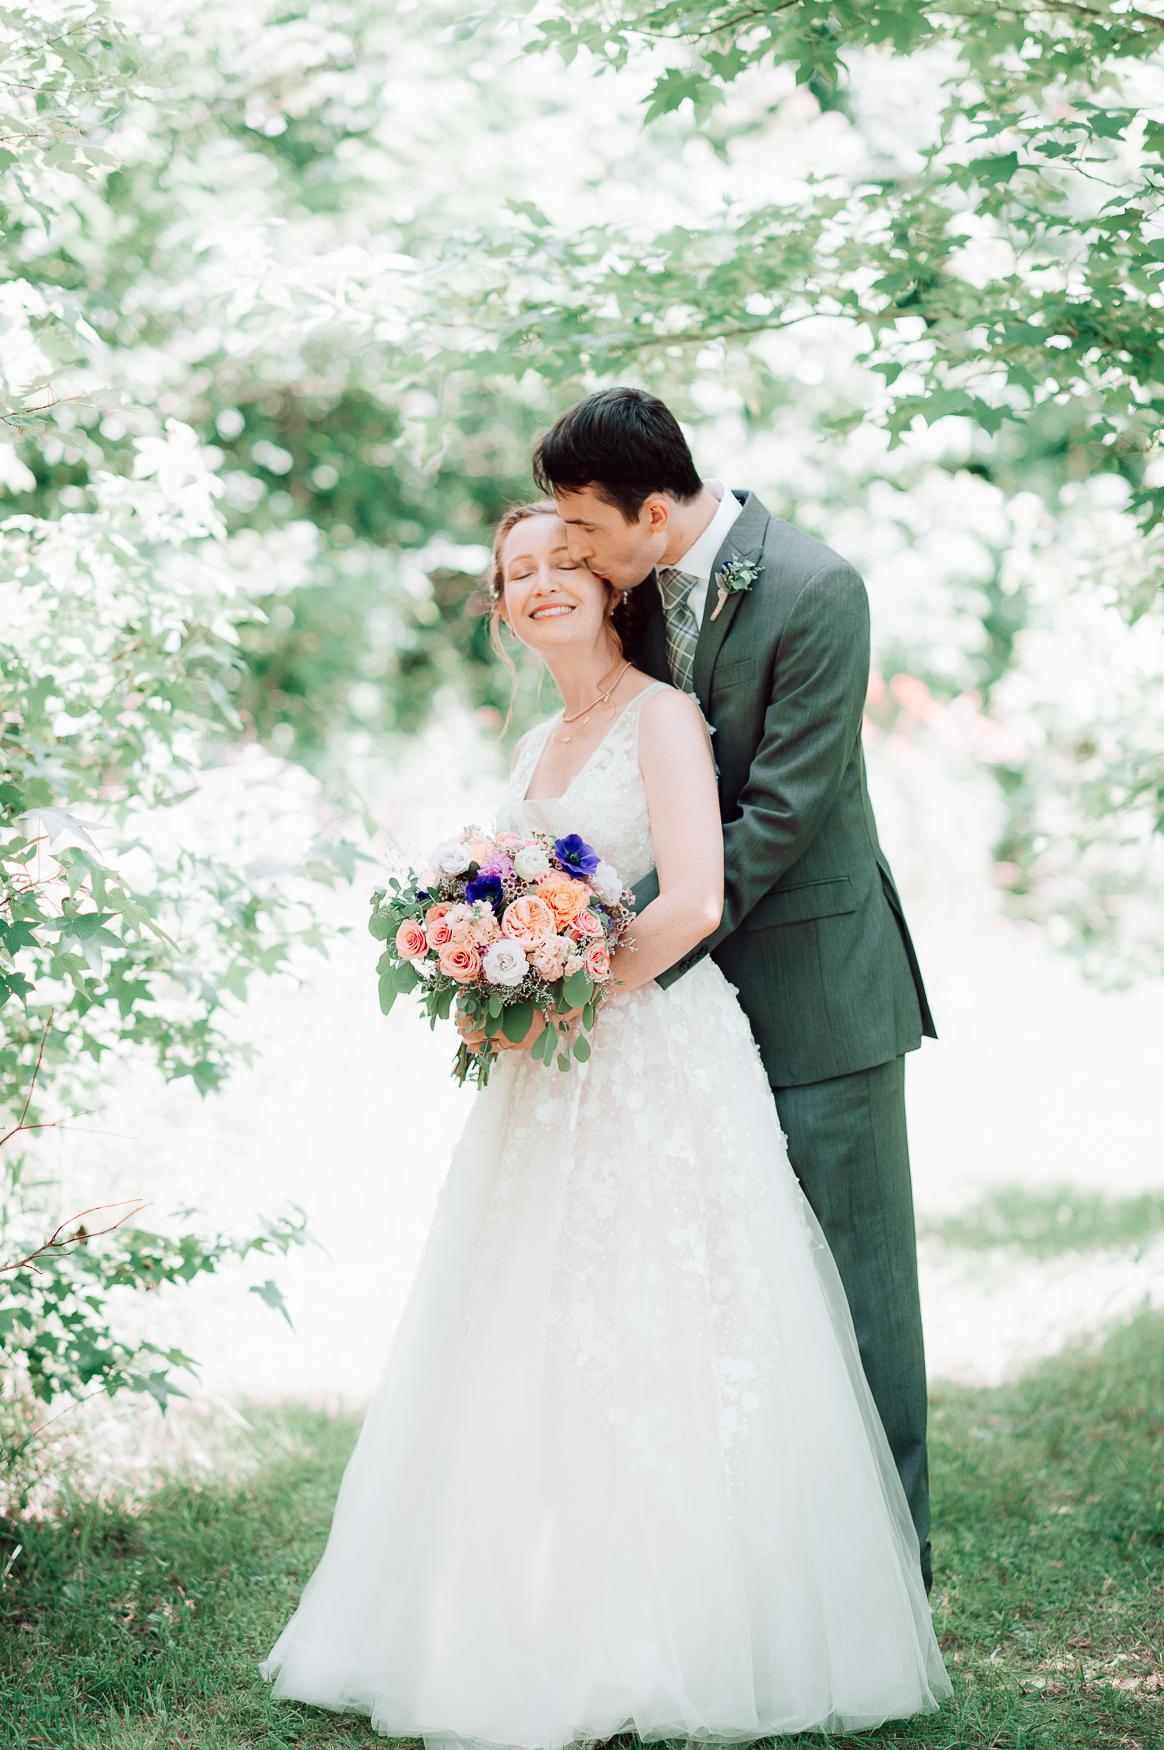 virginiawedding_theGlasgowFarm_rusticwedding_fredericksburg_youseephotography_CarolineDale (64).jpg